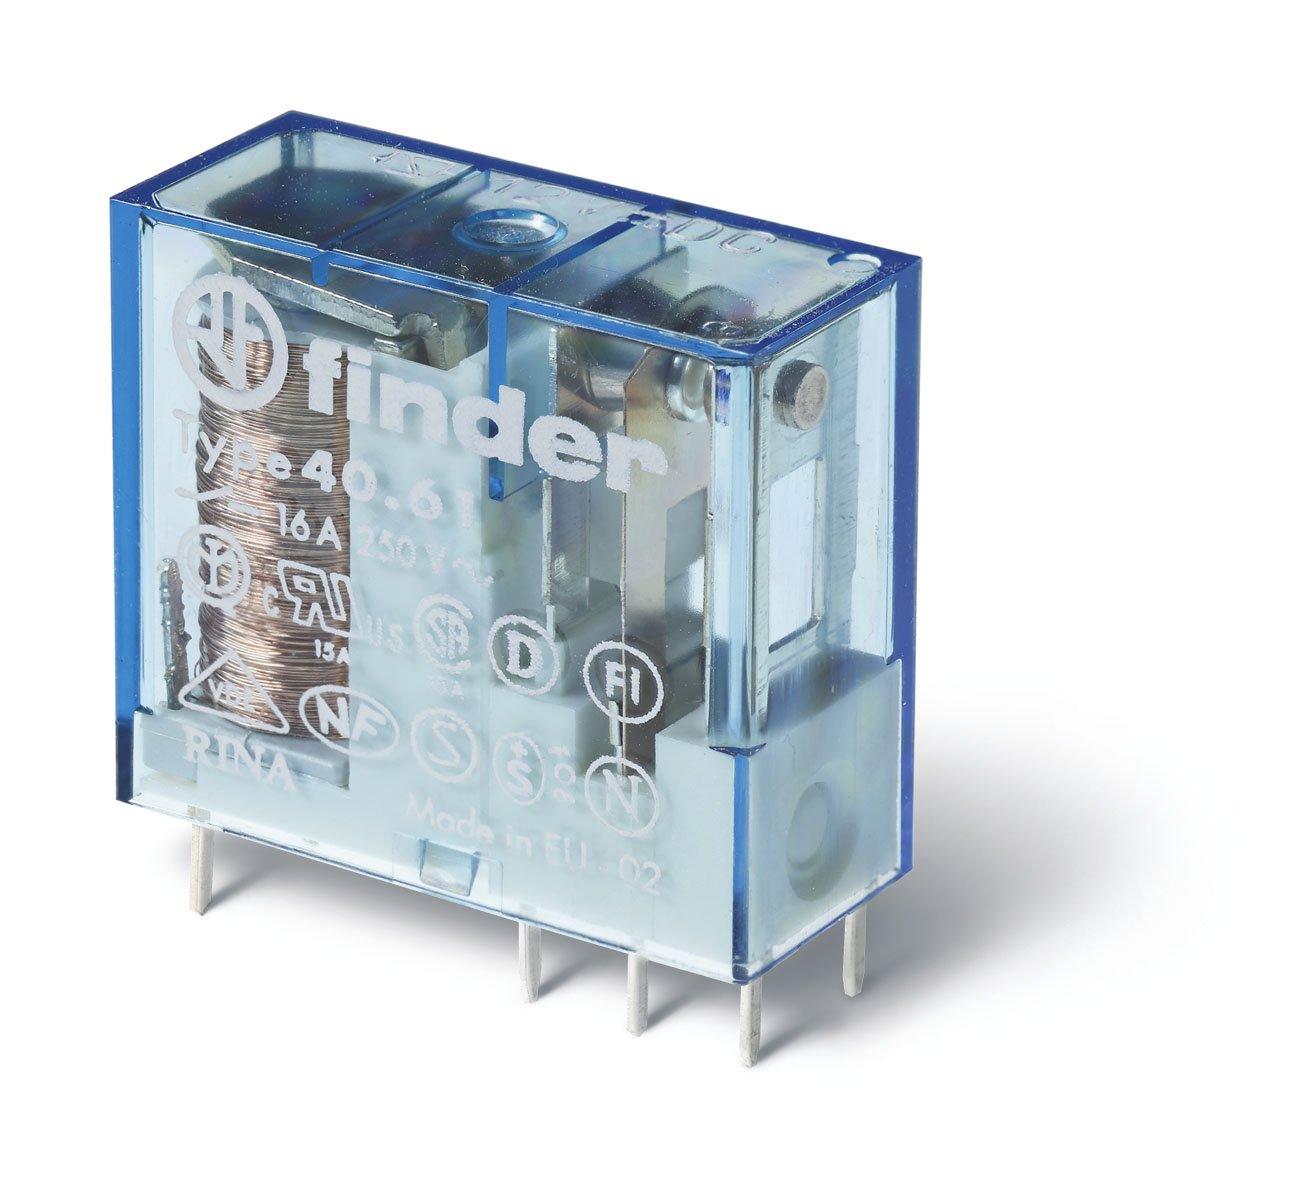 Finder 406190244000 Spdt 16a 24v Dc Coil Agsno2 Contact Hayward Goldline Aqualogic Main Printed Circuit Board Glxpcbmain Miniature Pcb Plug In Relay Industrial Scientific